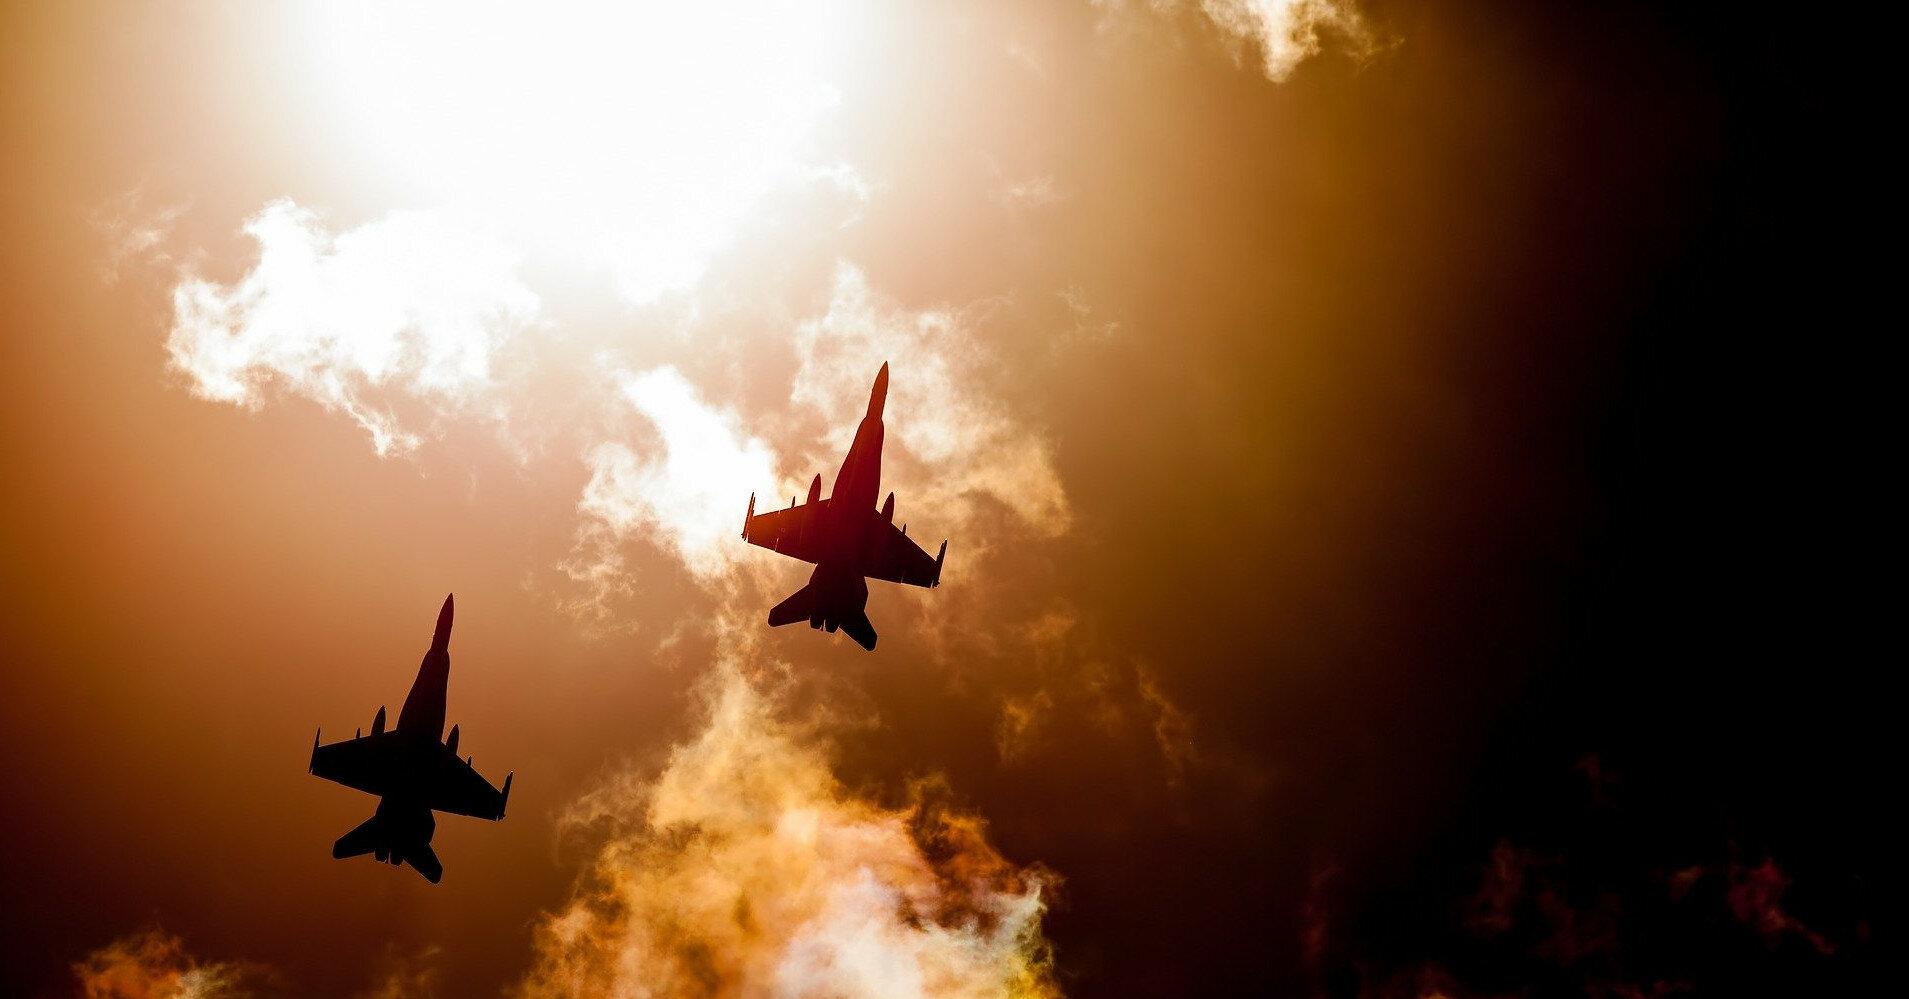 Патрули НАТО 8 раз за неделю сопровождали самолеты РФ